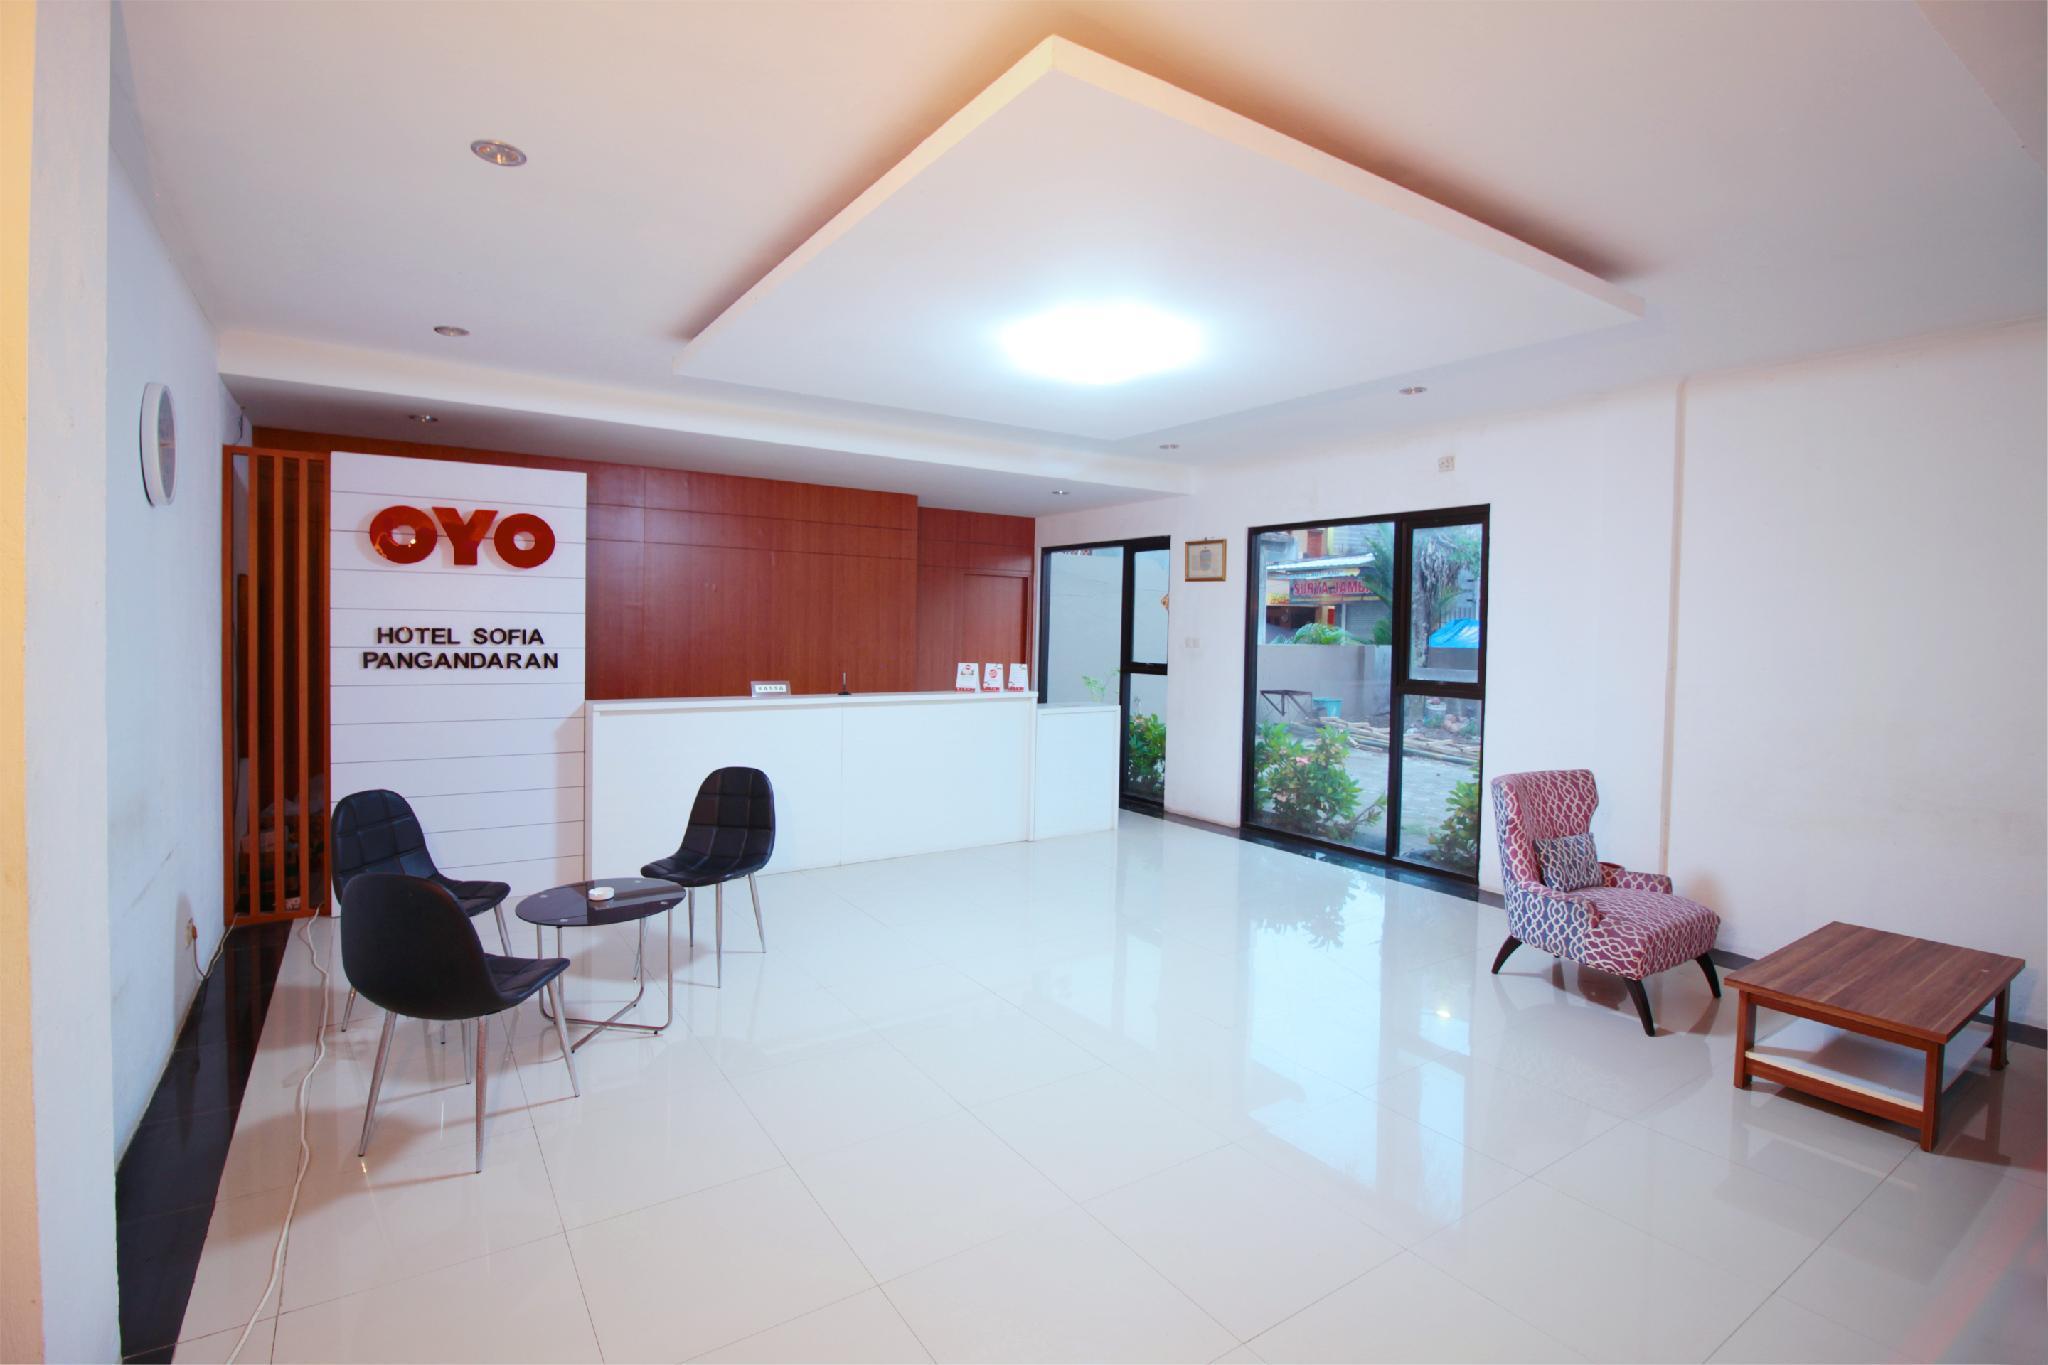 OYO 370 Hotel Sofia Pangandaran